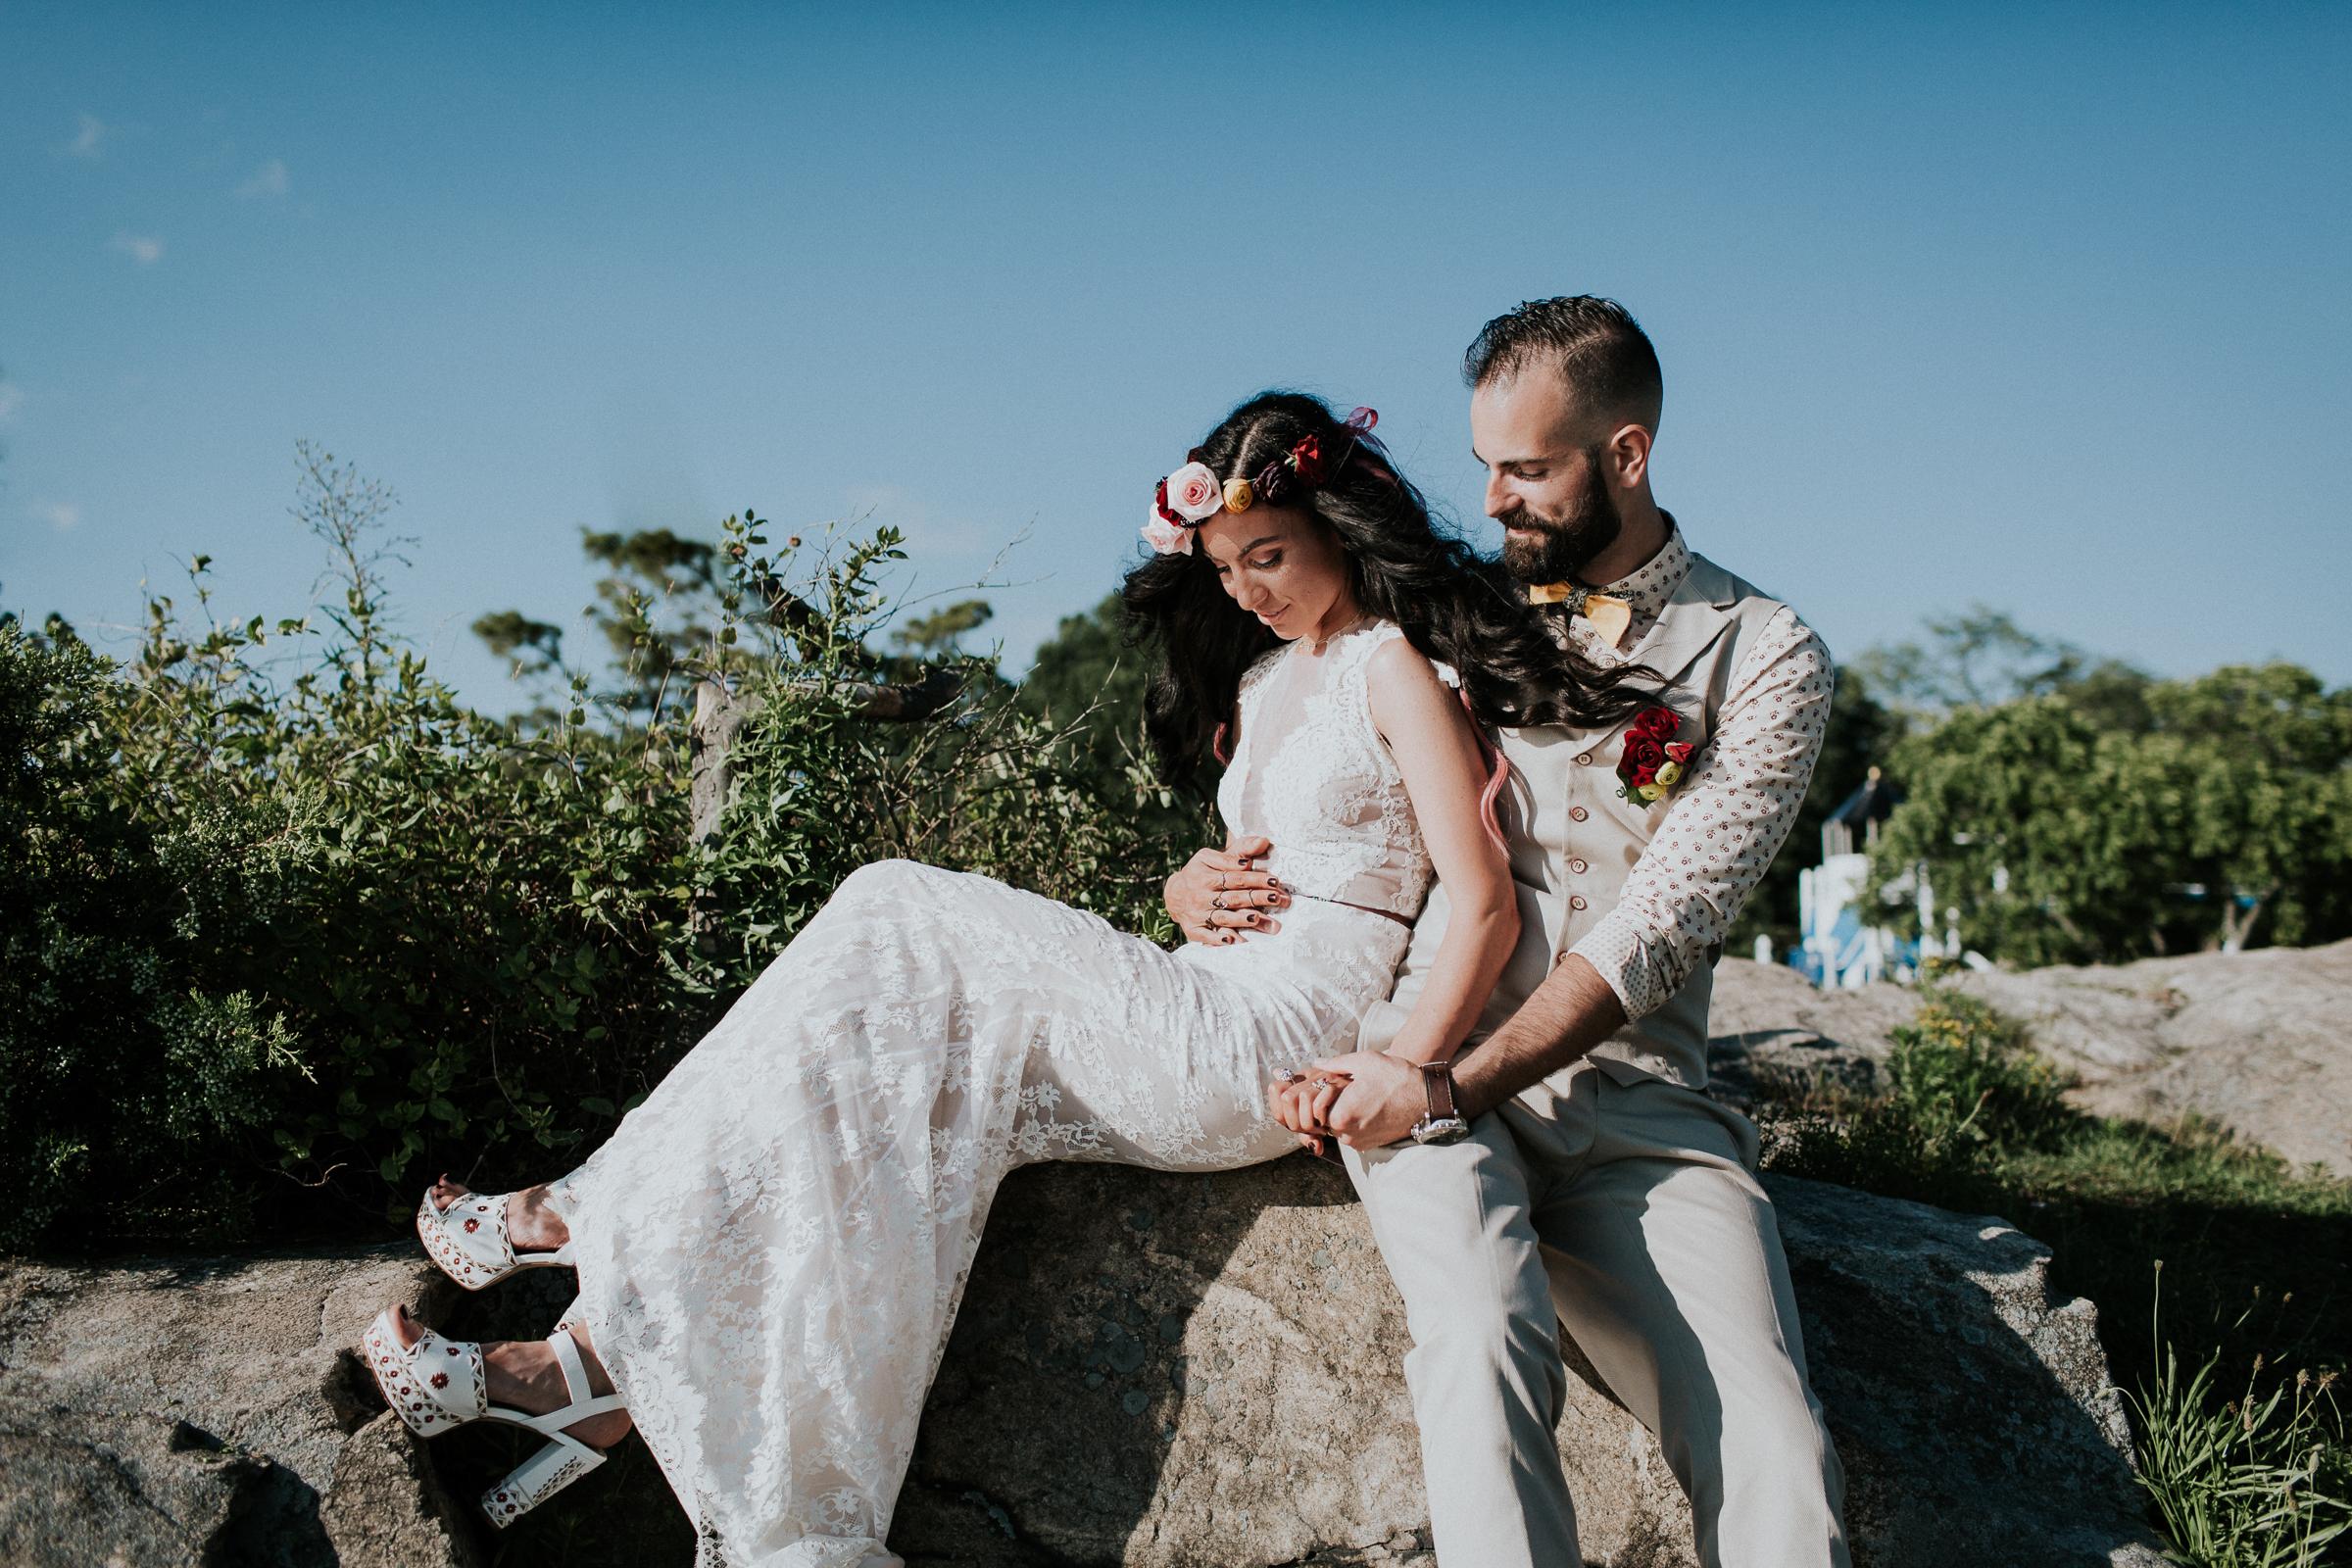 Backyard-Intimate-Adventurous-Destination-Wedding-Darien-Connecticut-Documentary-Wedding-Photography-81.jpg